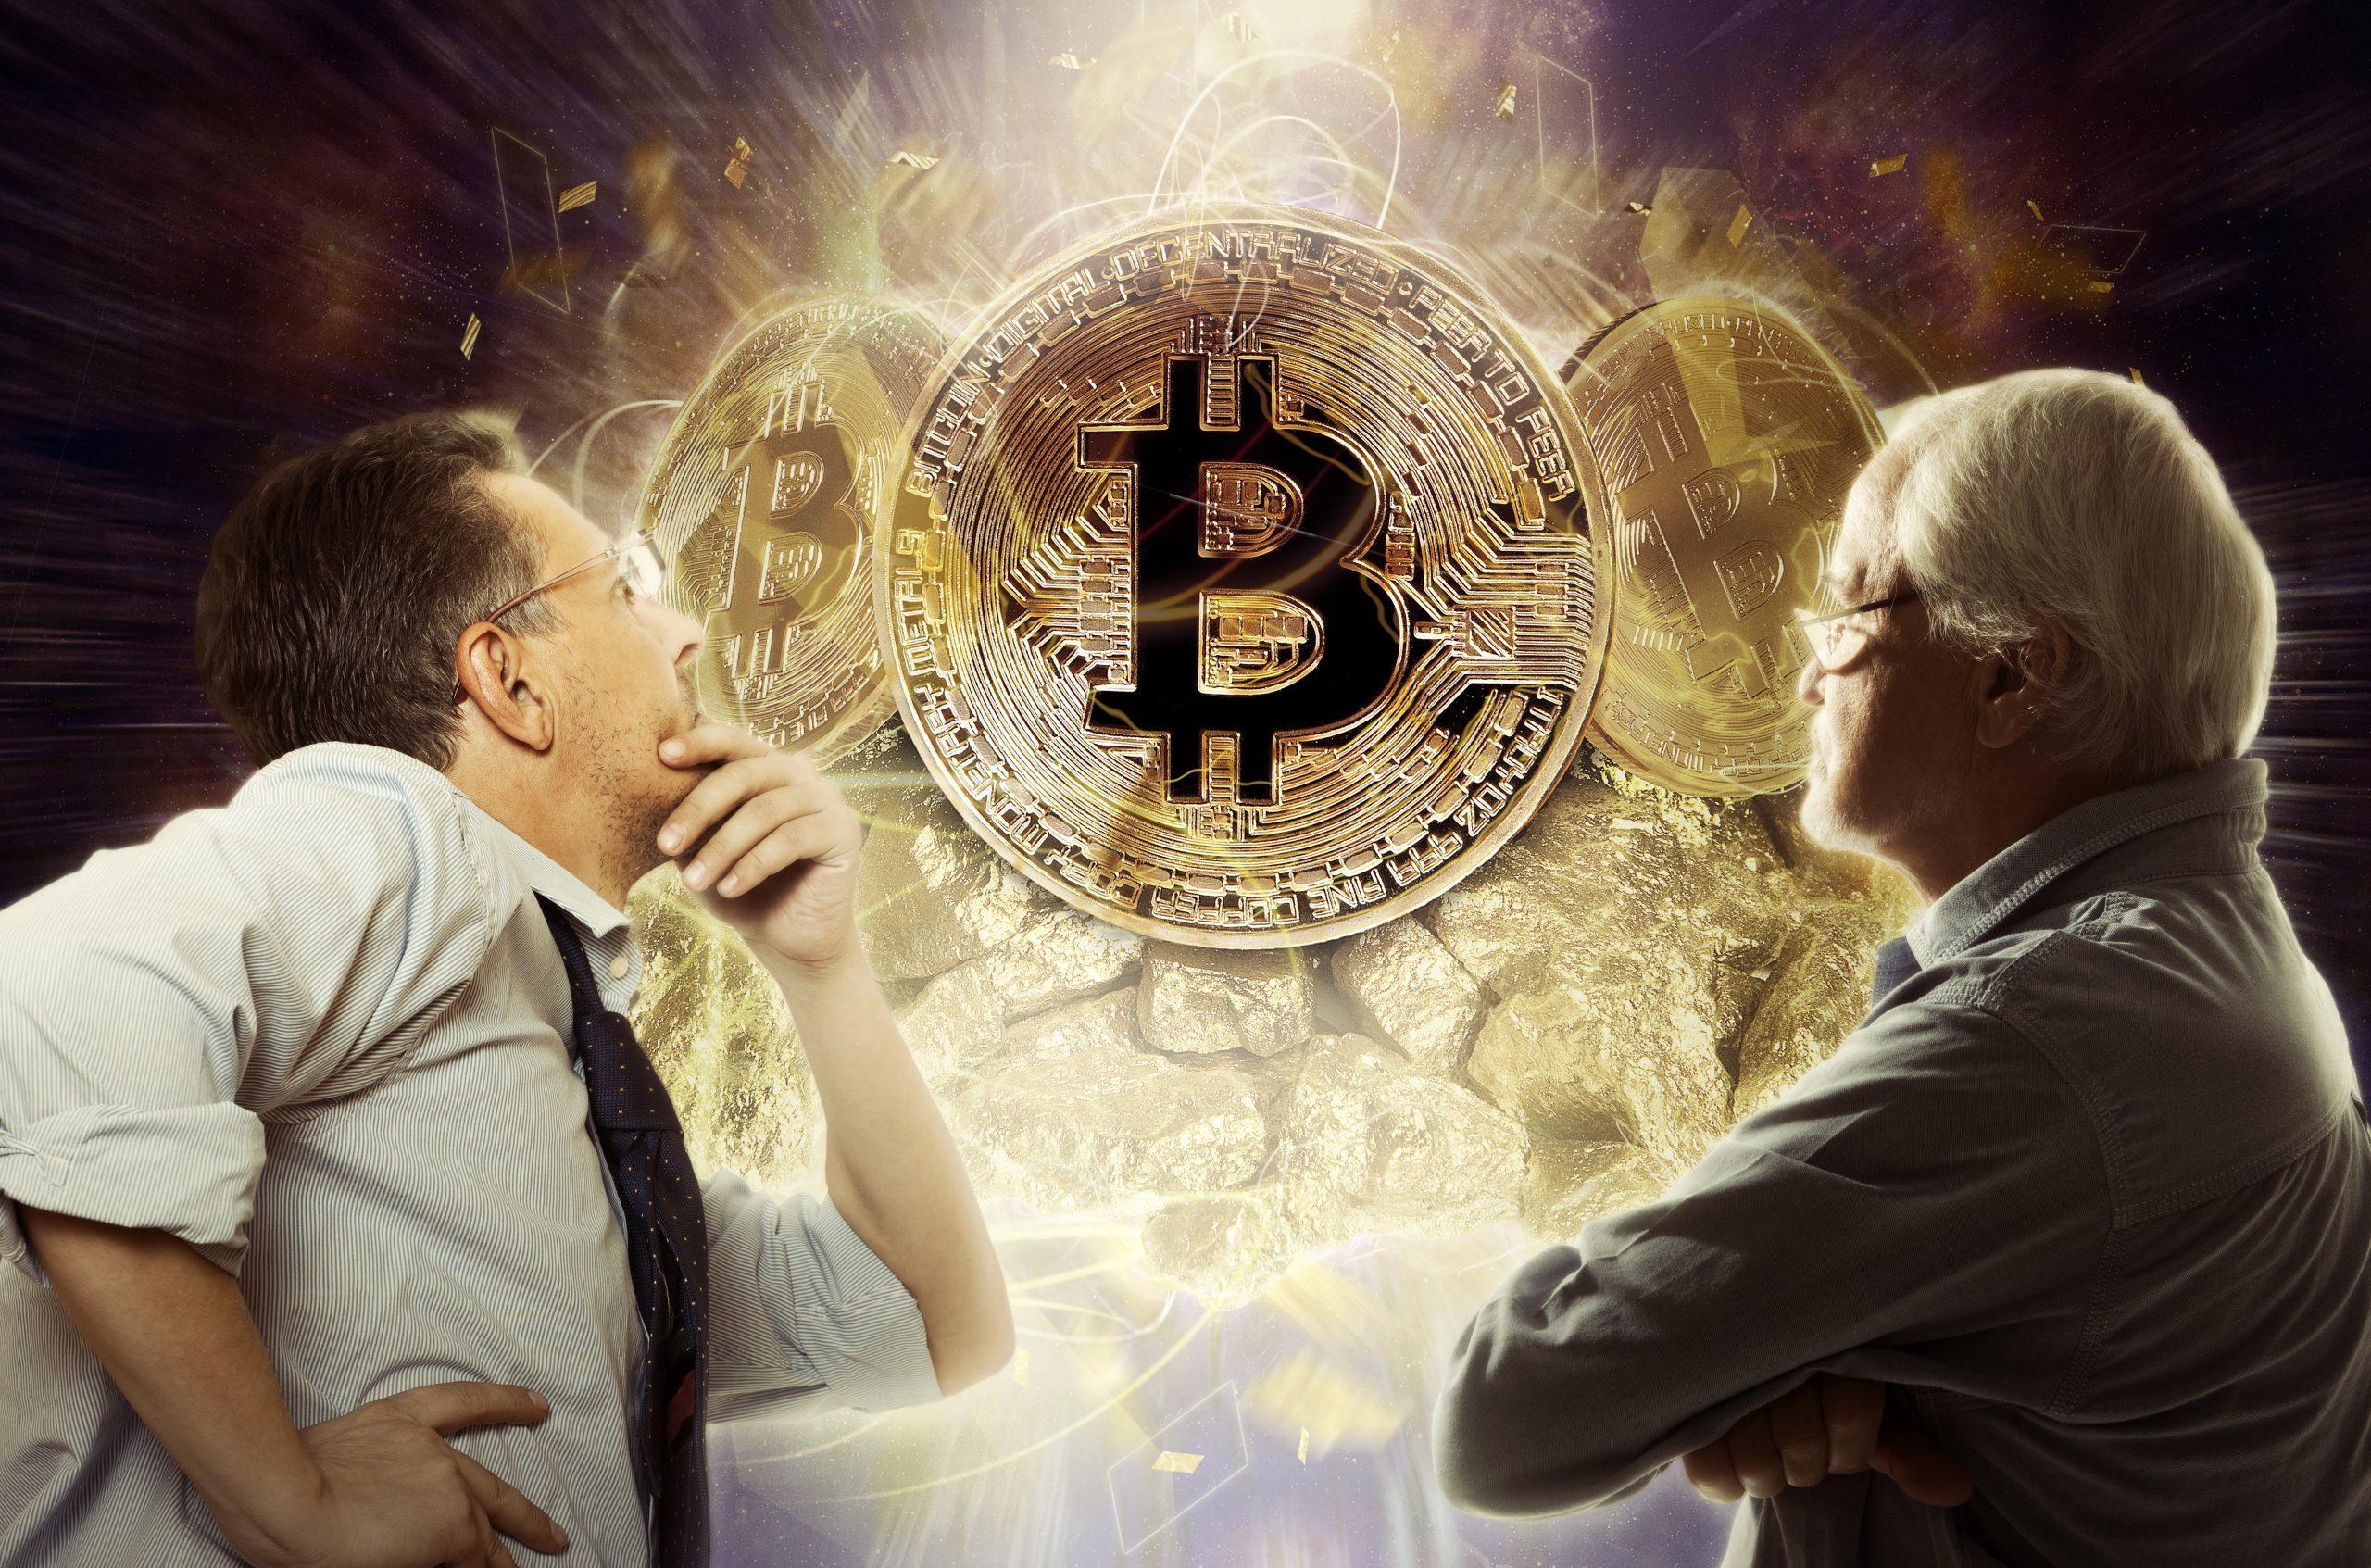 Bitcoin opinions - Billionaires have spoken